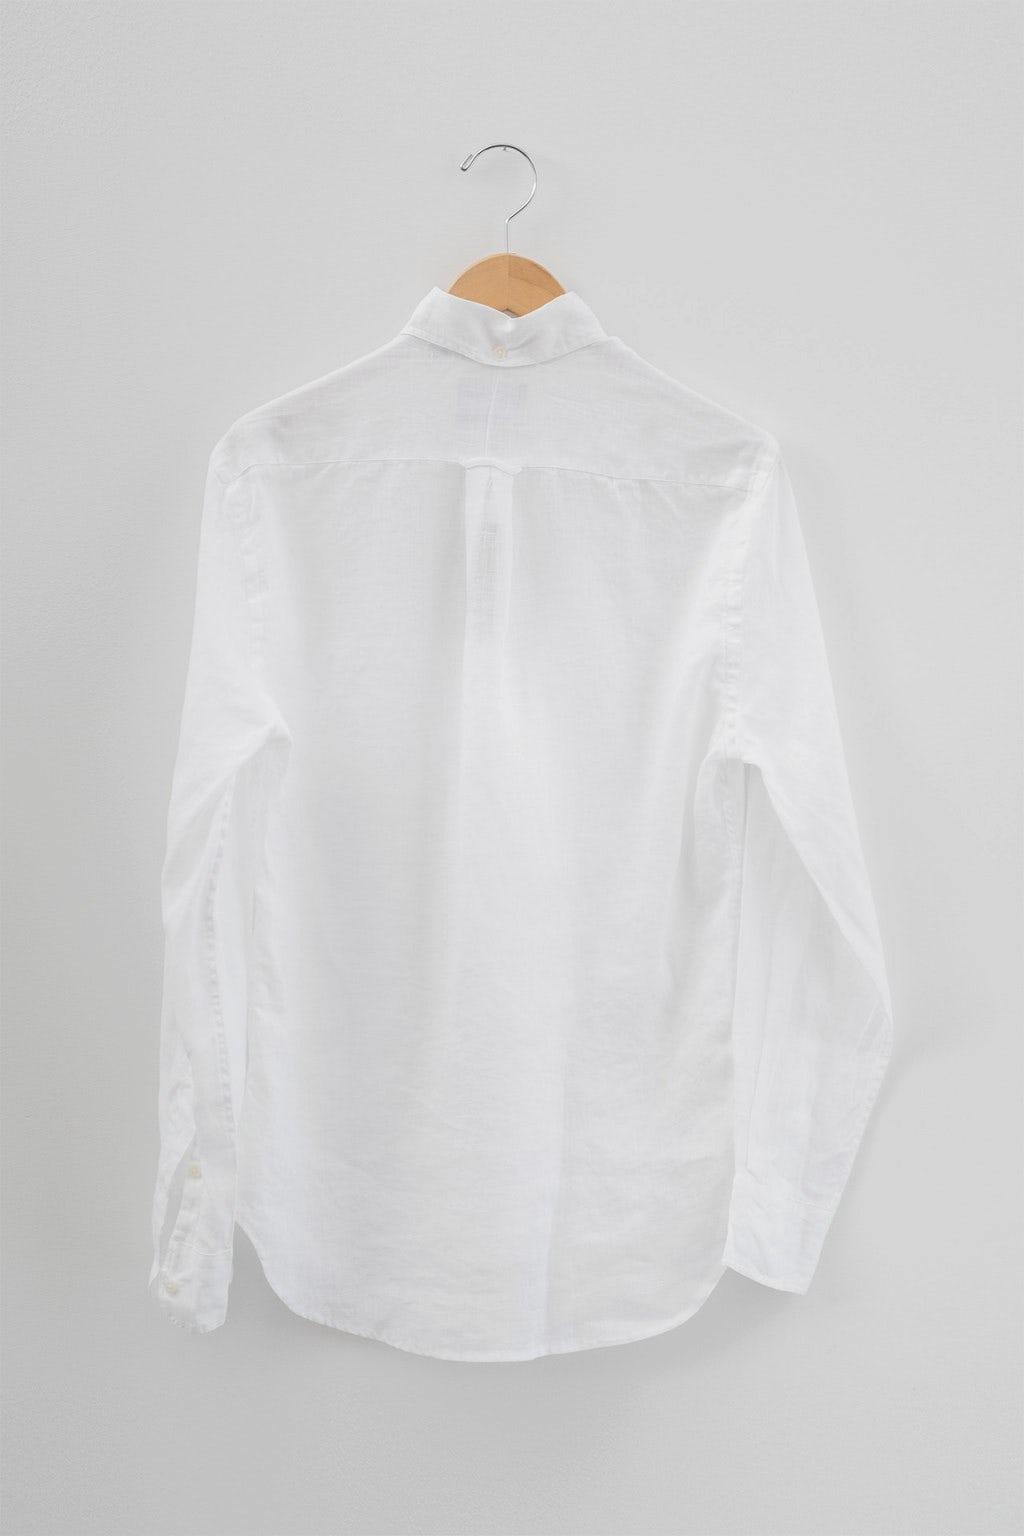 Gitman Bros. Vintage Button Down White Linen